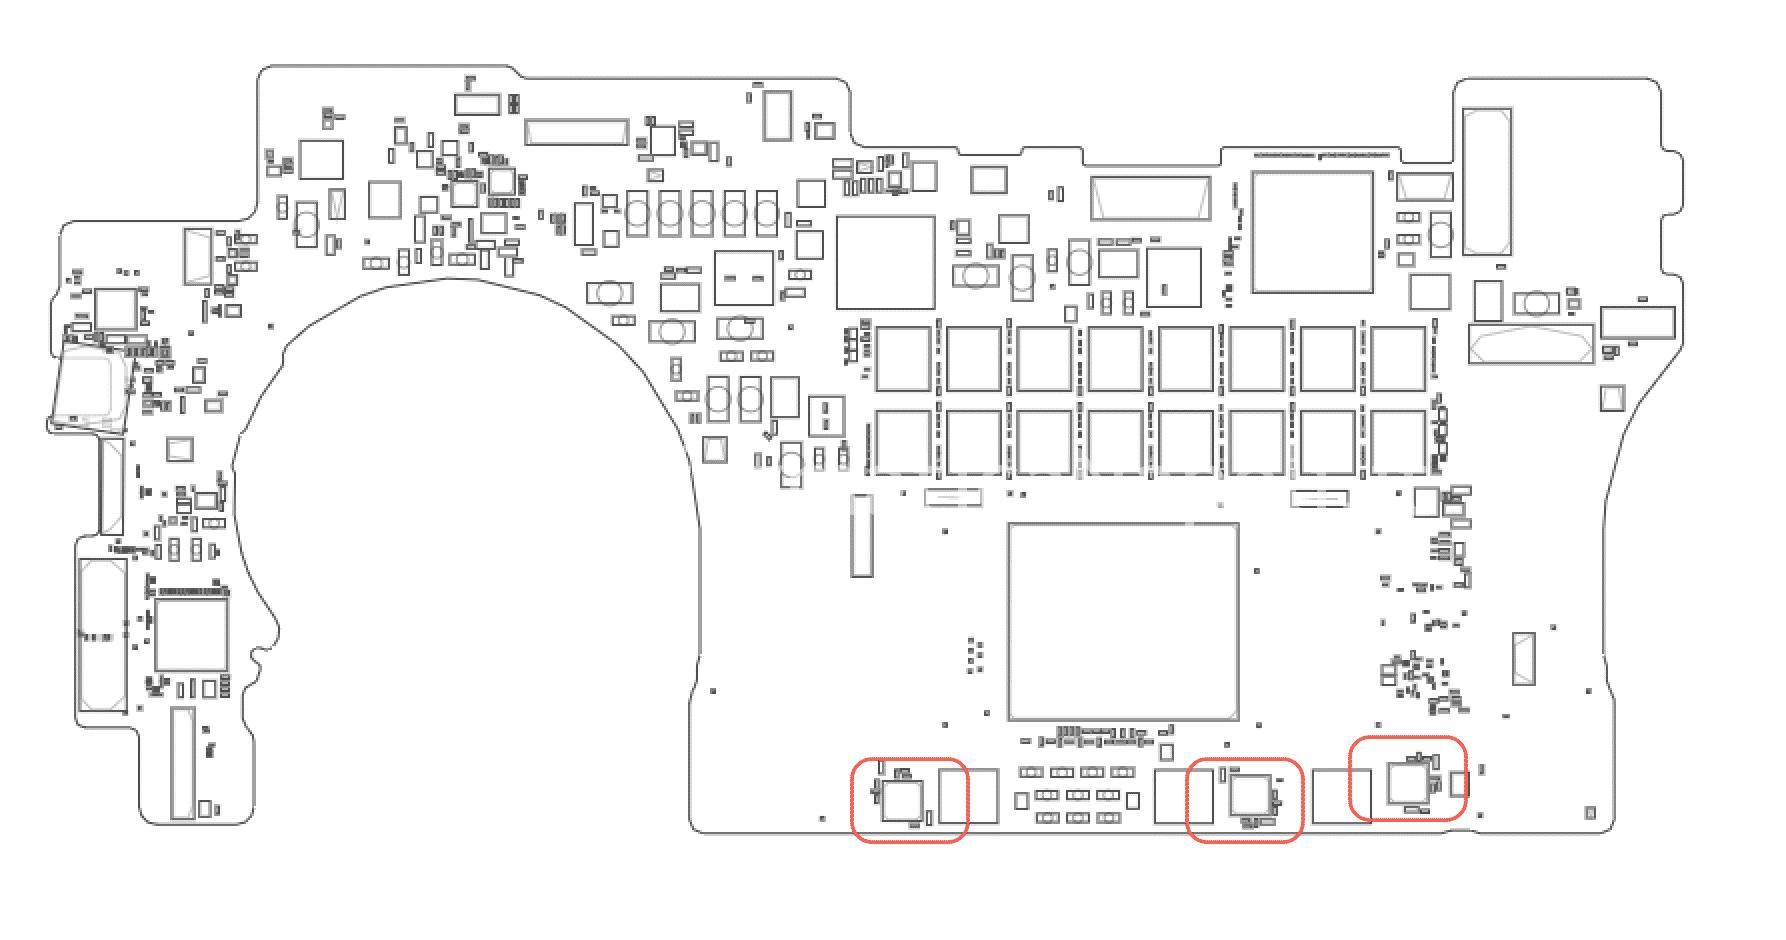 problema spegnimento improvviso macbook pro 15 retina 820-3662-A 2014 fasi synchronous buck DC-DC